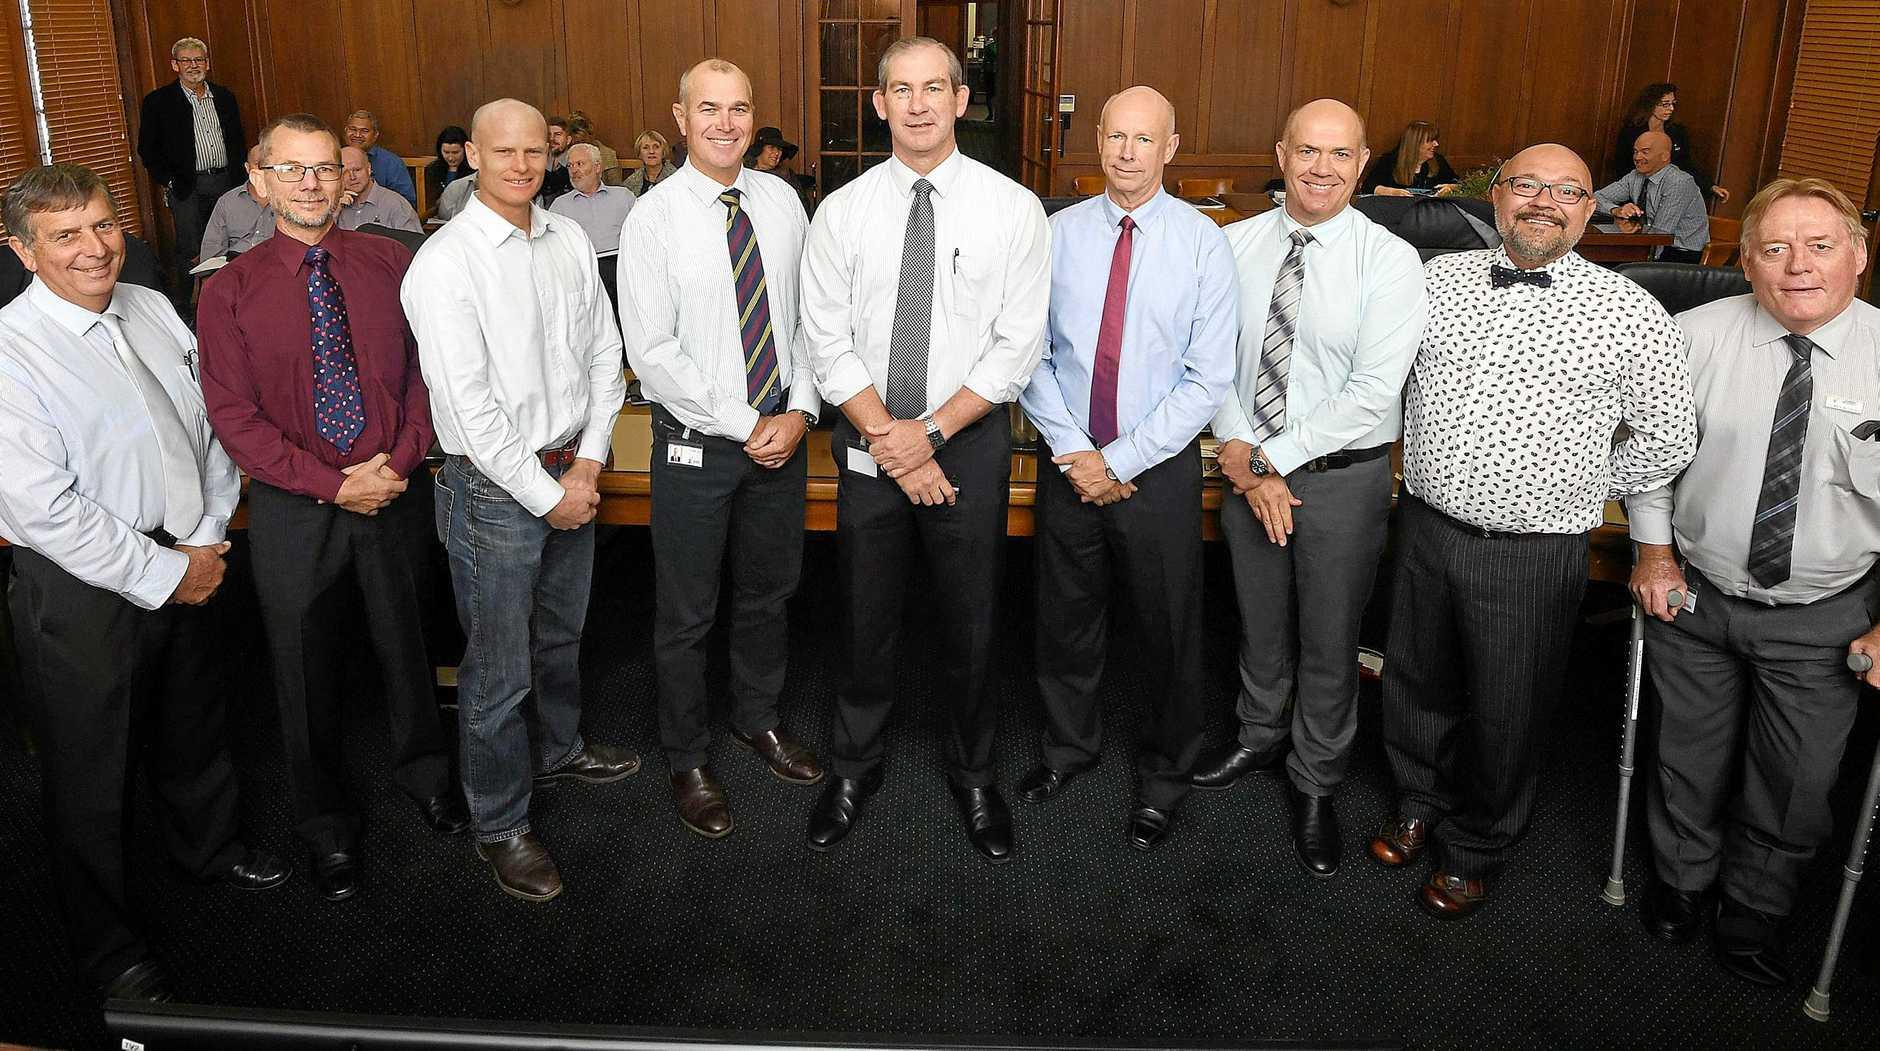 Gympie Council Hilary Smerdon, Dan Stewart, Glen Hartwig, Bob Leitch, Mick Curran, Bob Fredman, Mal Gear, Daryl Dodt and Mark McDonald.